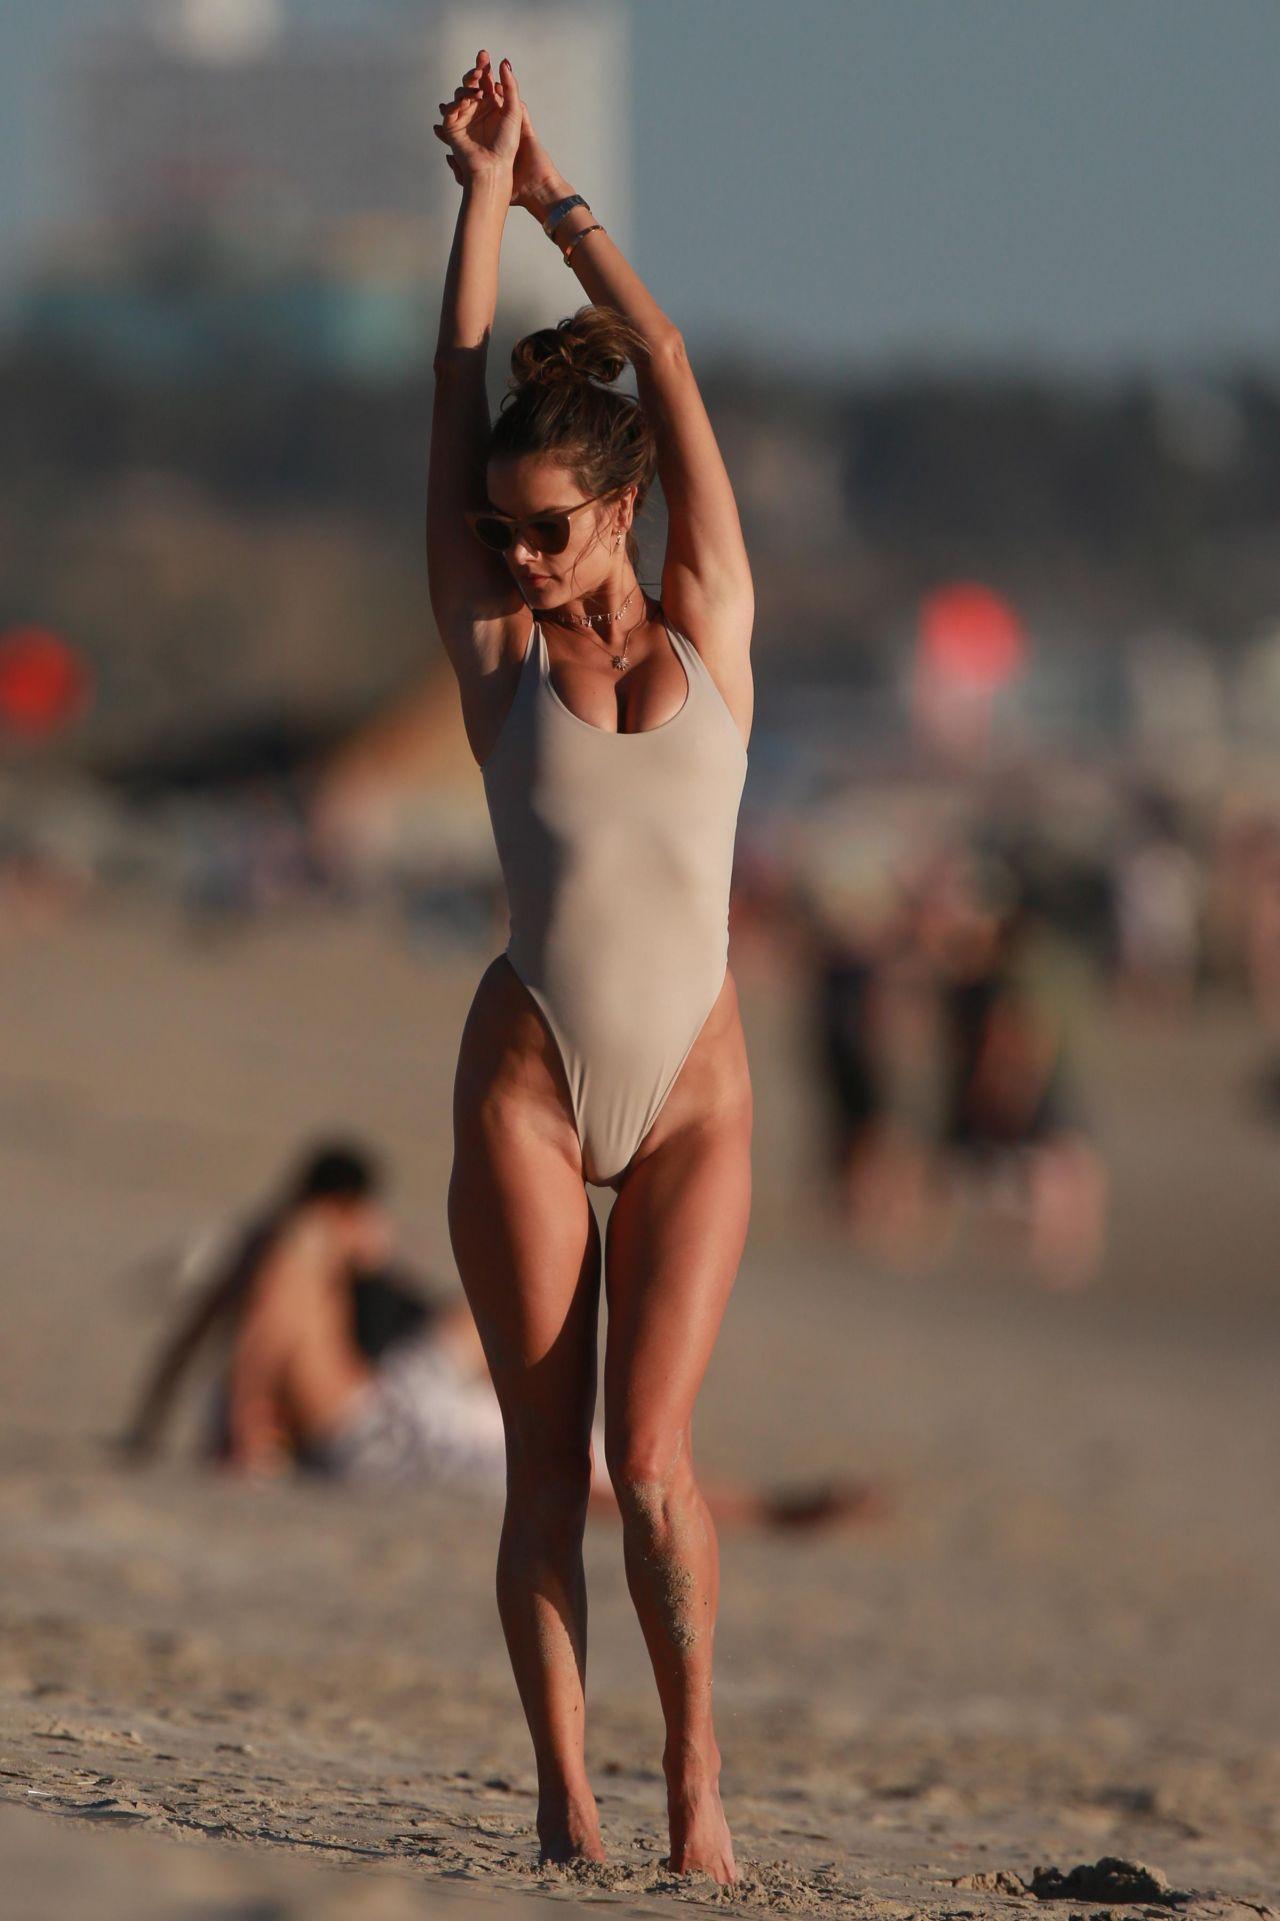 Alessandra Ambrosio in Bikini at the Beach in Malibu 0128